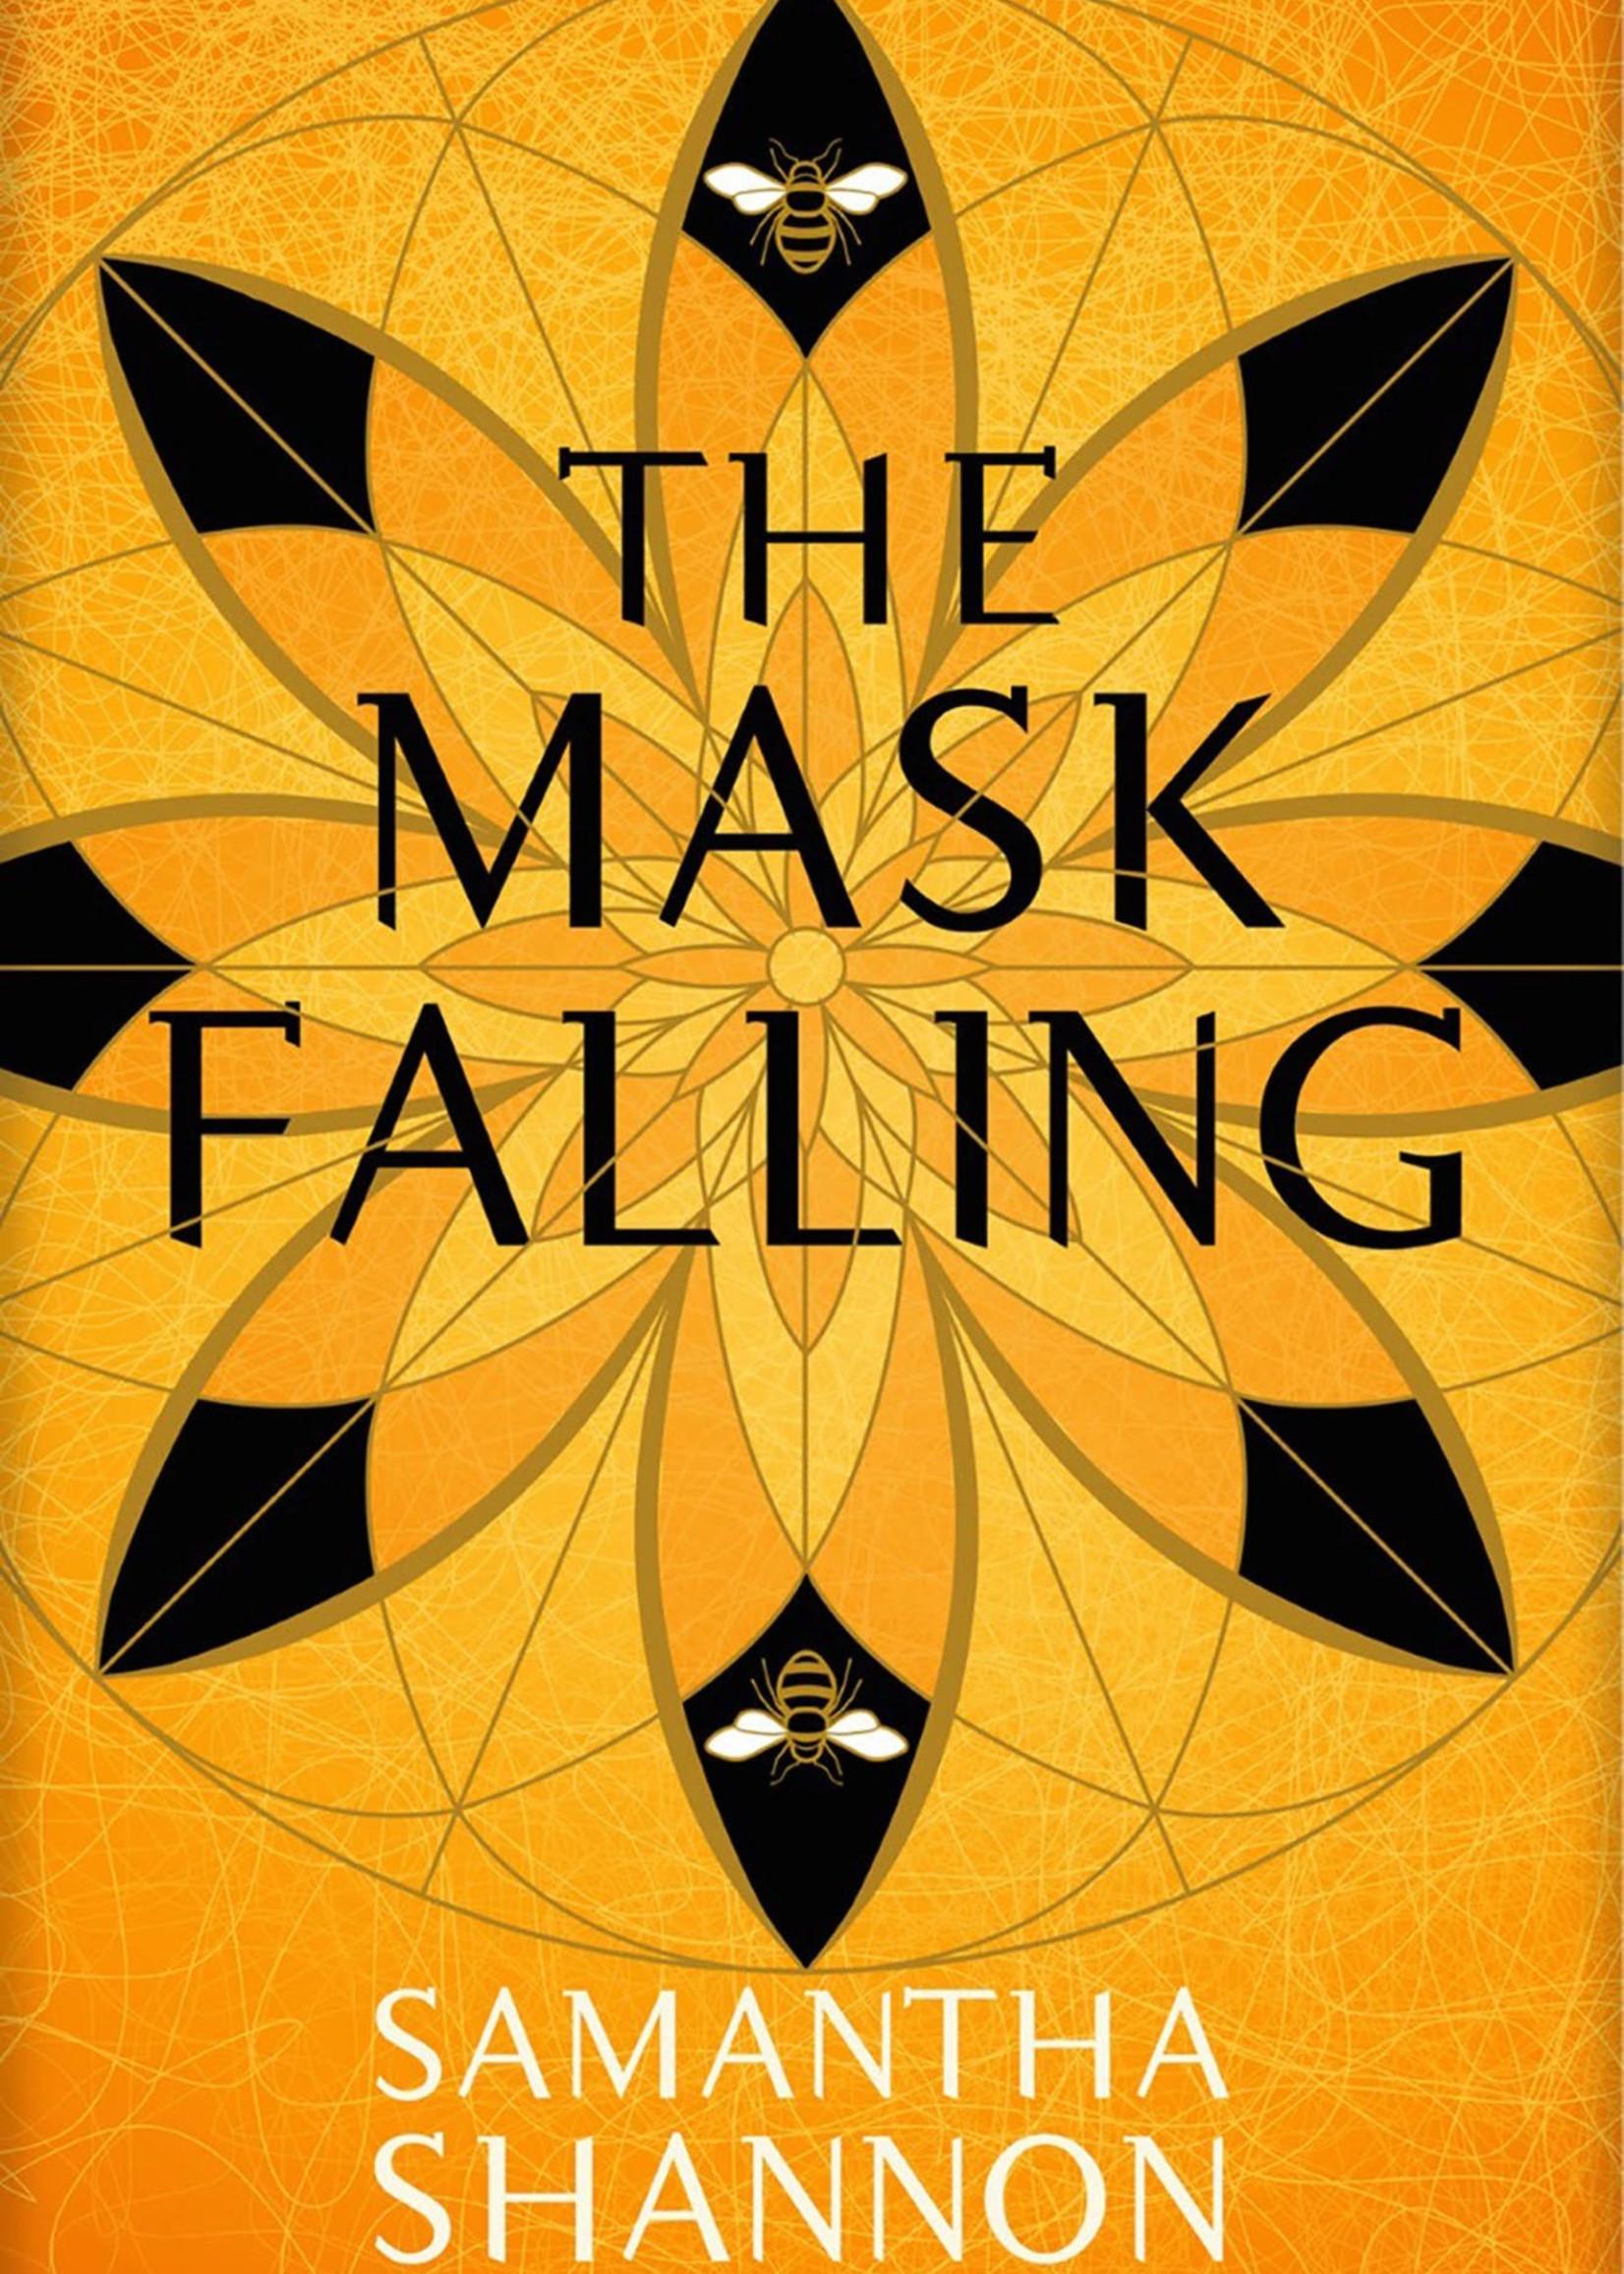 The Mask Falling (The Bone Season #4) by Samantha Shannon